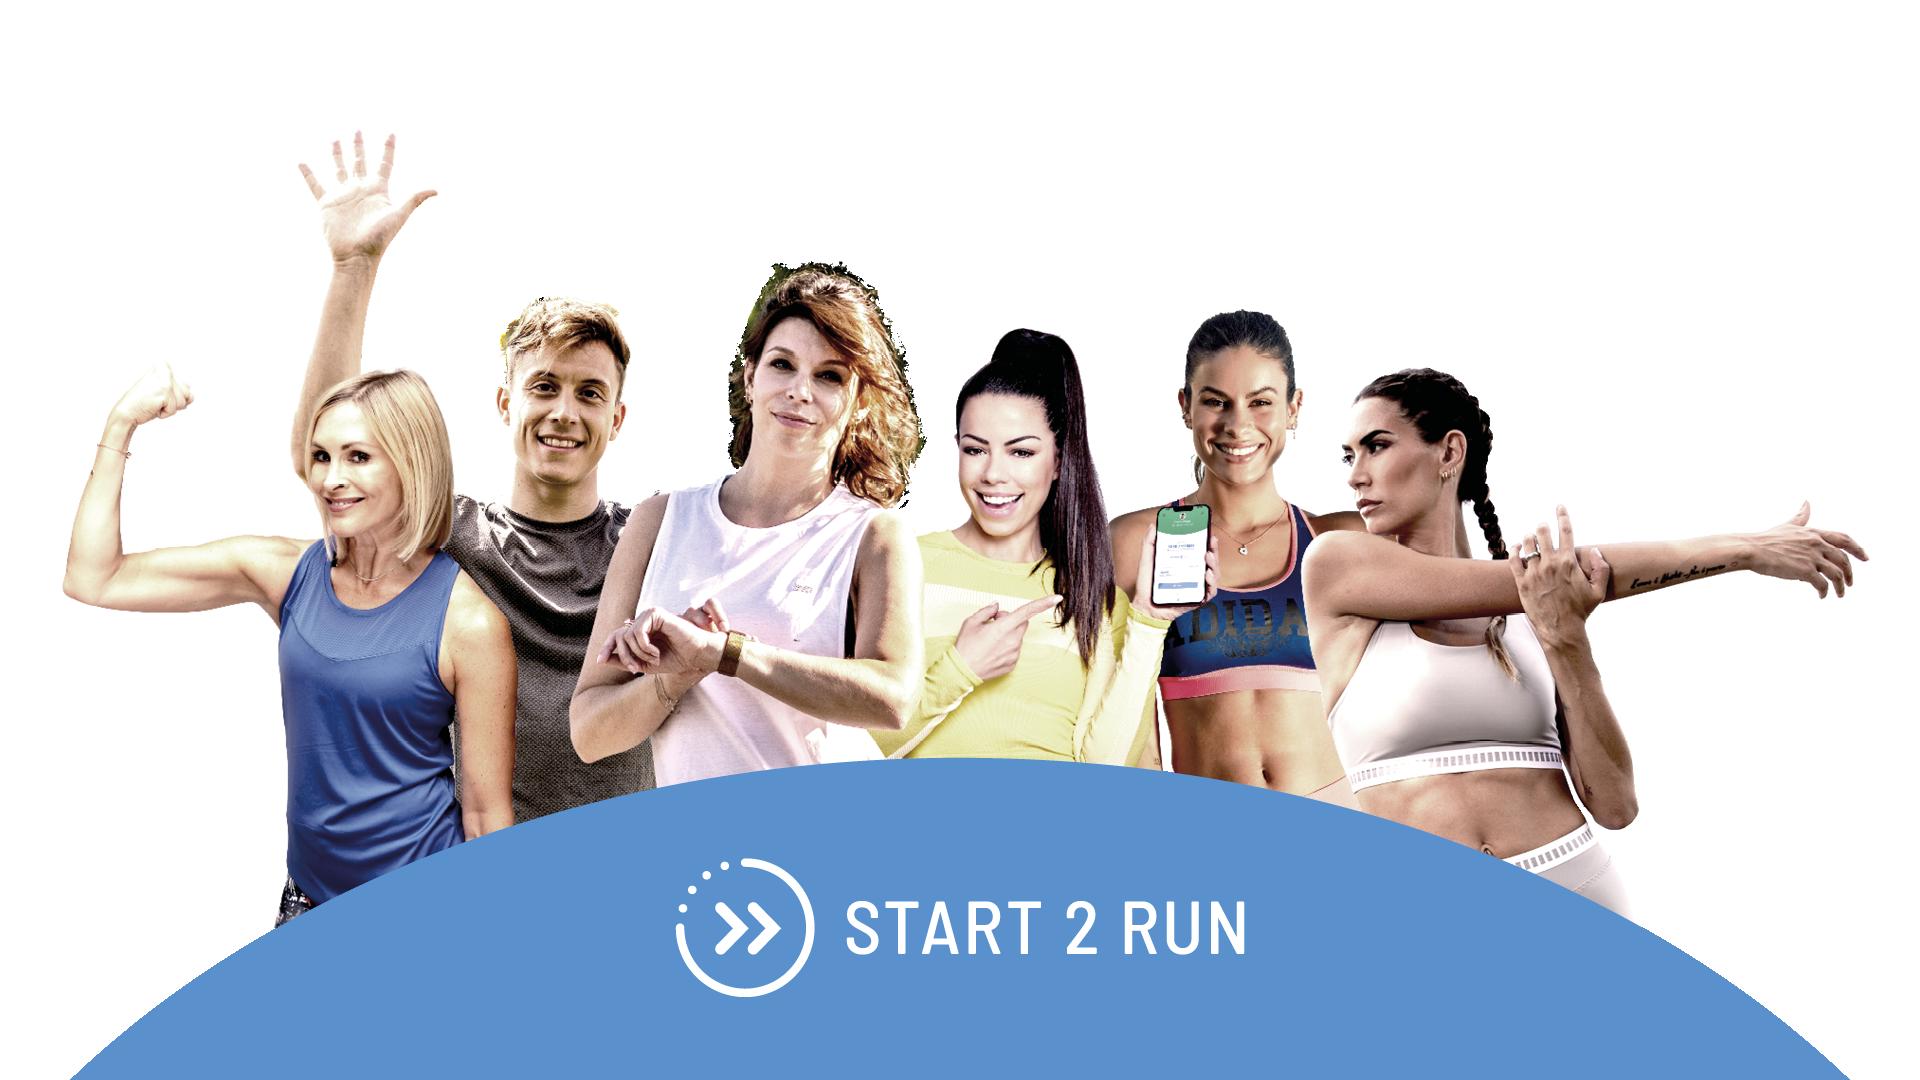 Start 2 Run coaches